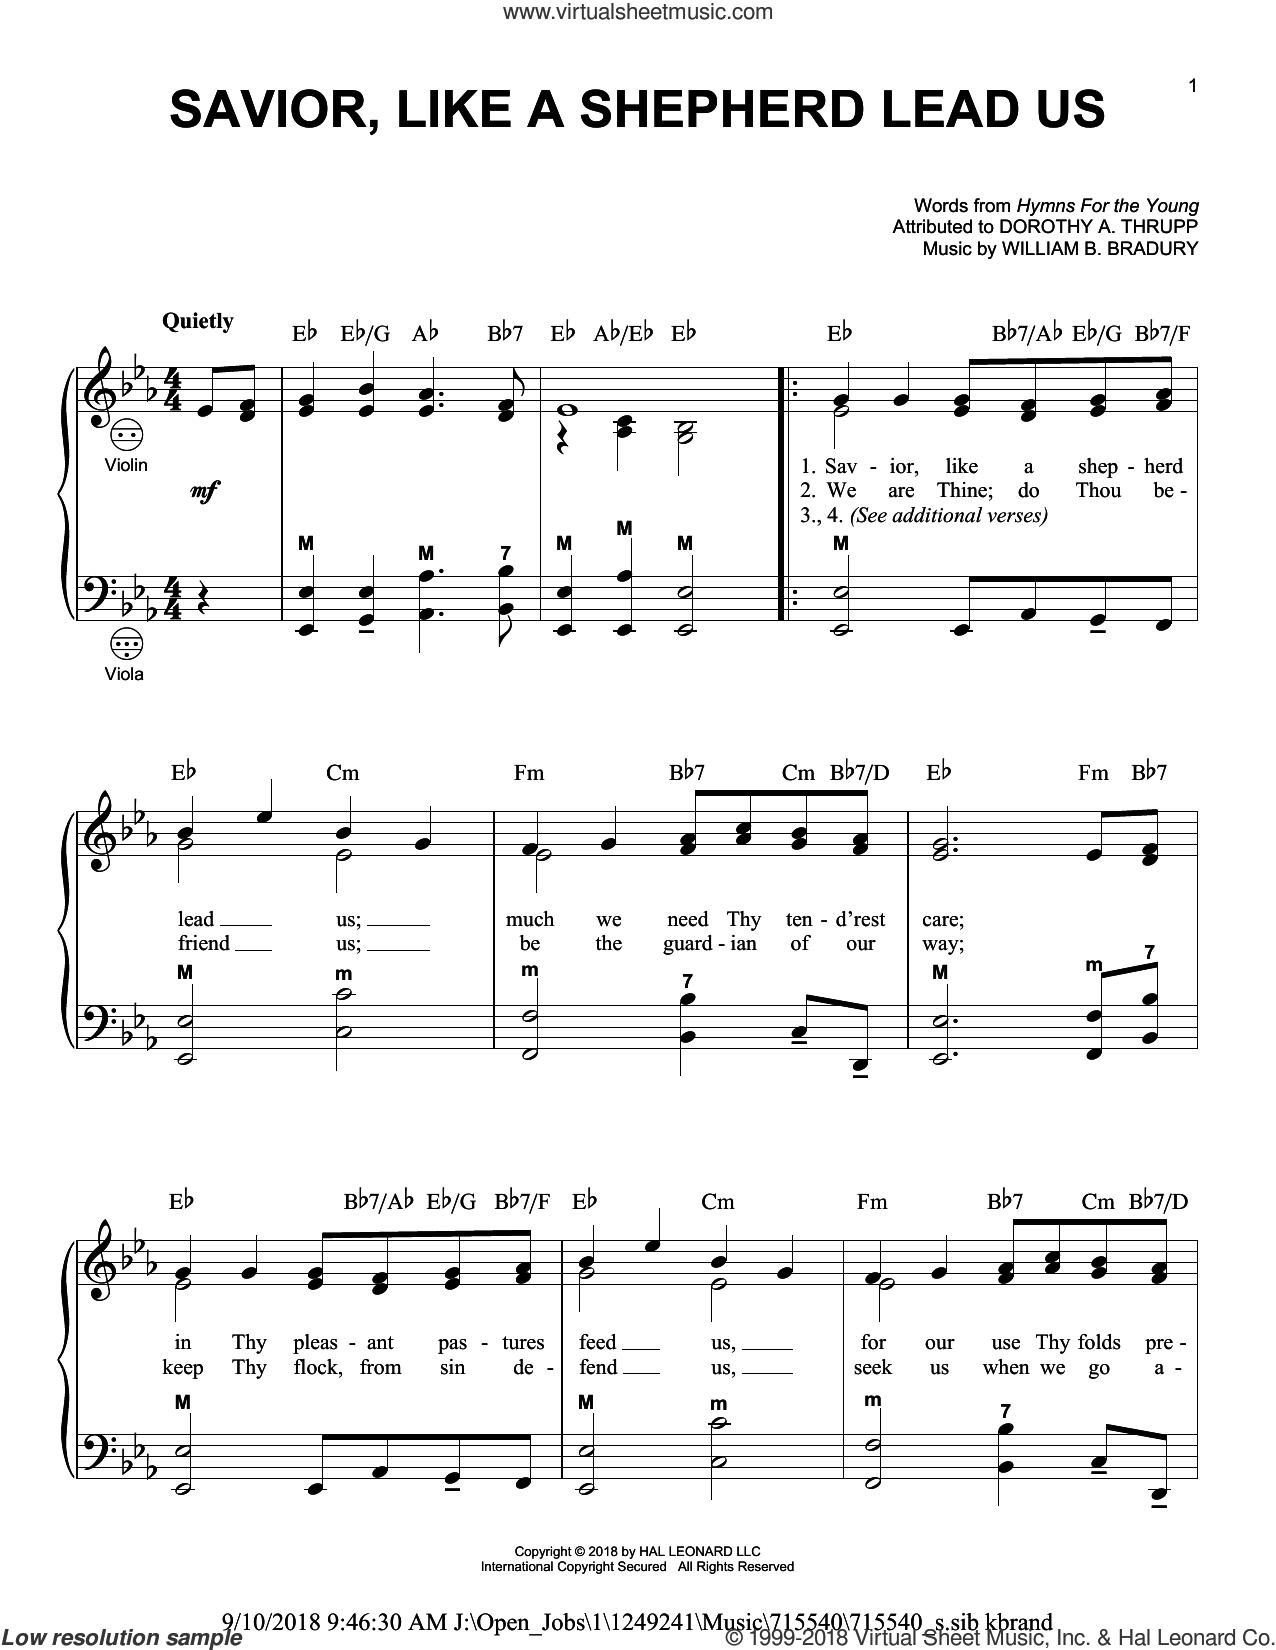 Savior, Like A Shepherd Lead Us sheet music for accordion by William B. Bradbury, Gary Meisner and Dorothy A. Thrupp, intermediate skill level